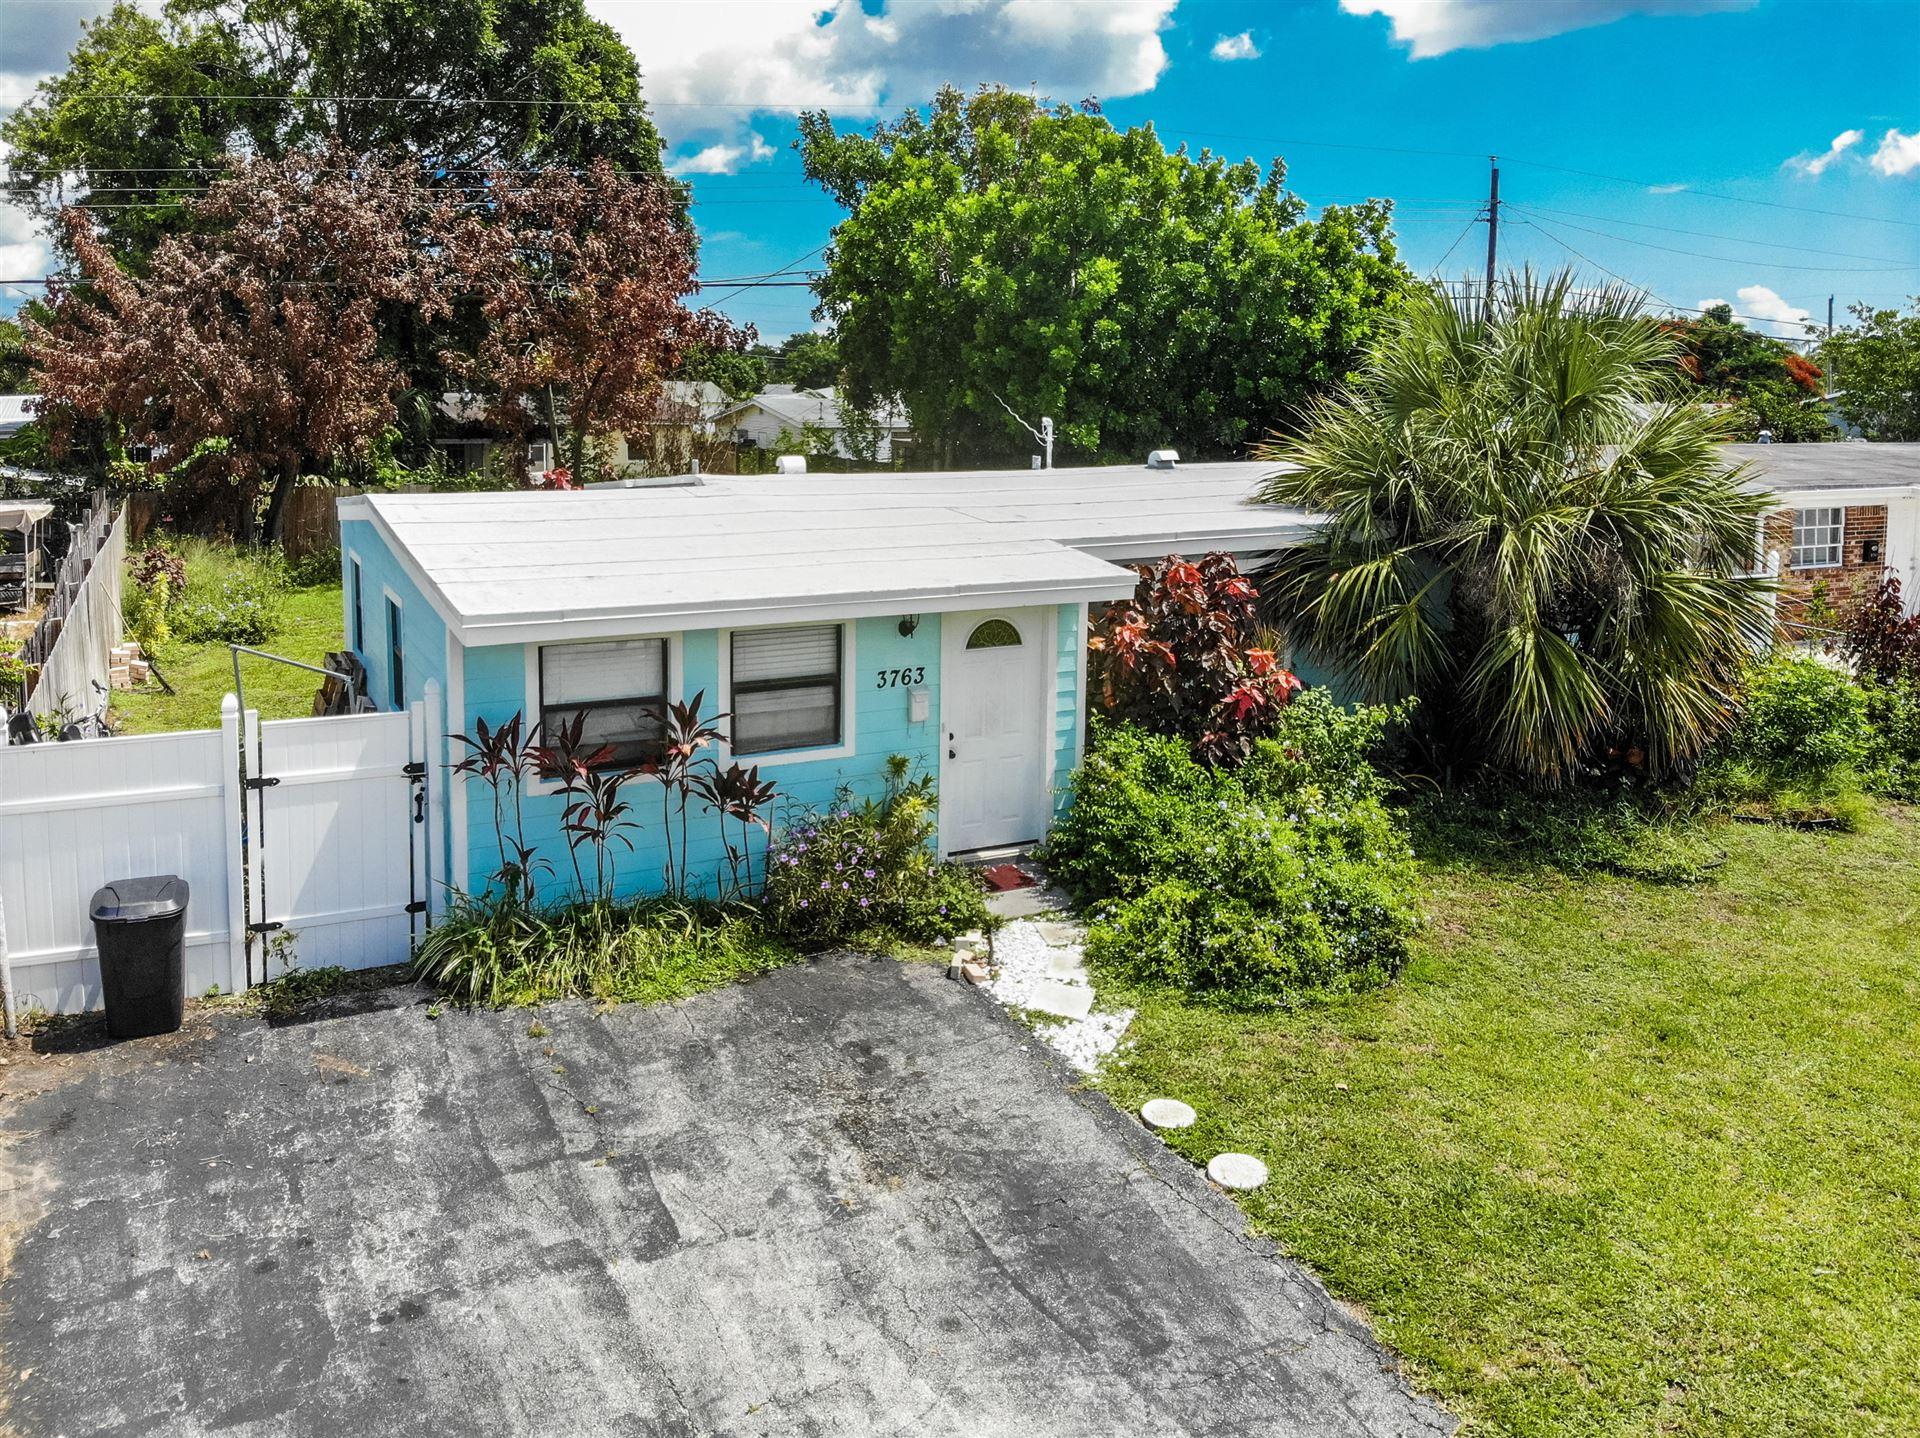 3763 Florida Boulevard, Palm Beach Gardens, FL 33410 - MLS#: RX-10705406